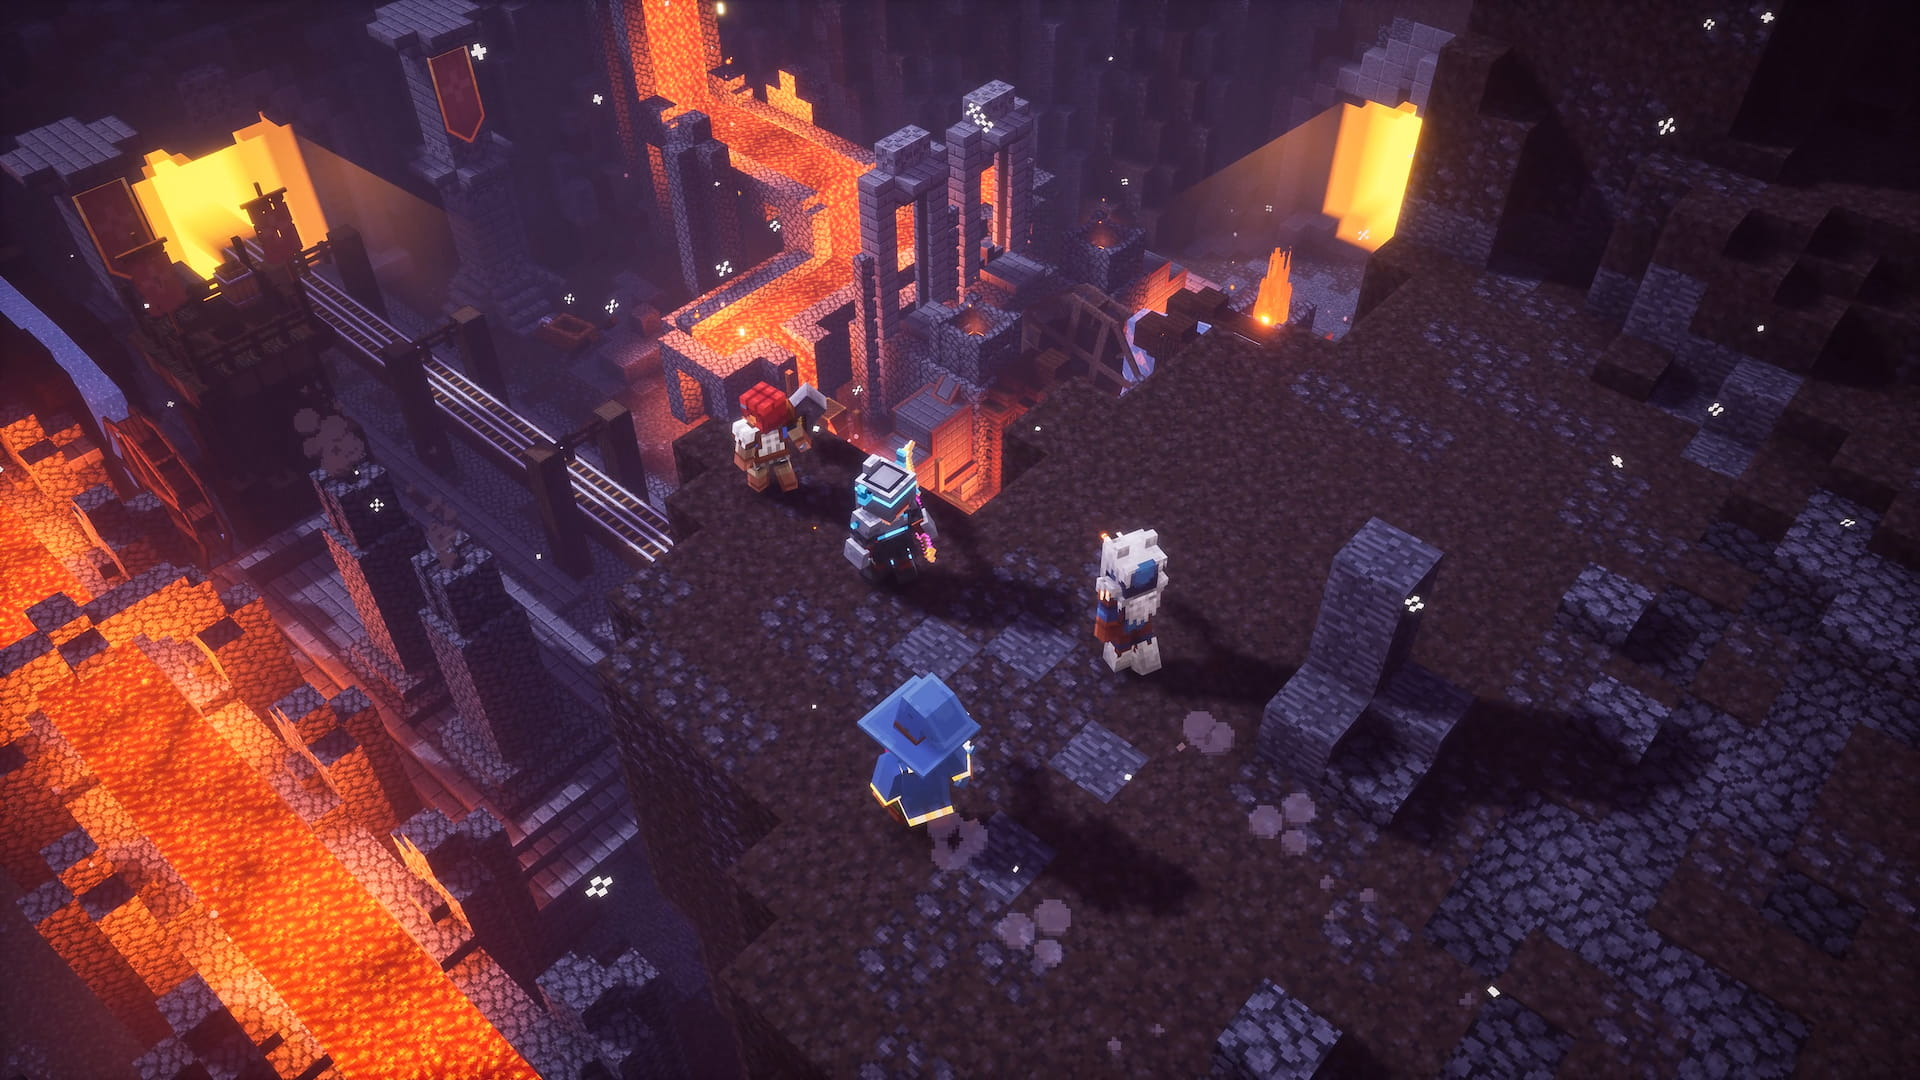 minecraft_dungeons_screenshot_1.jpg